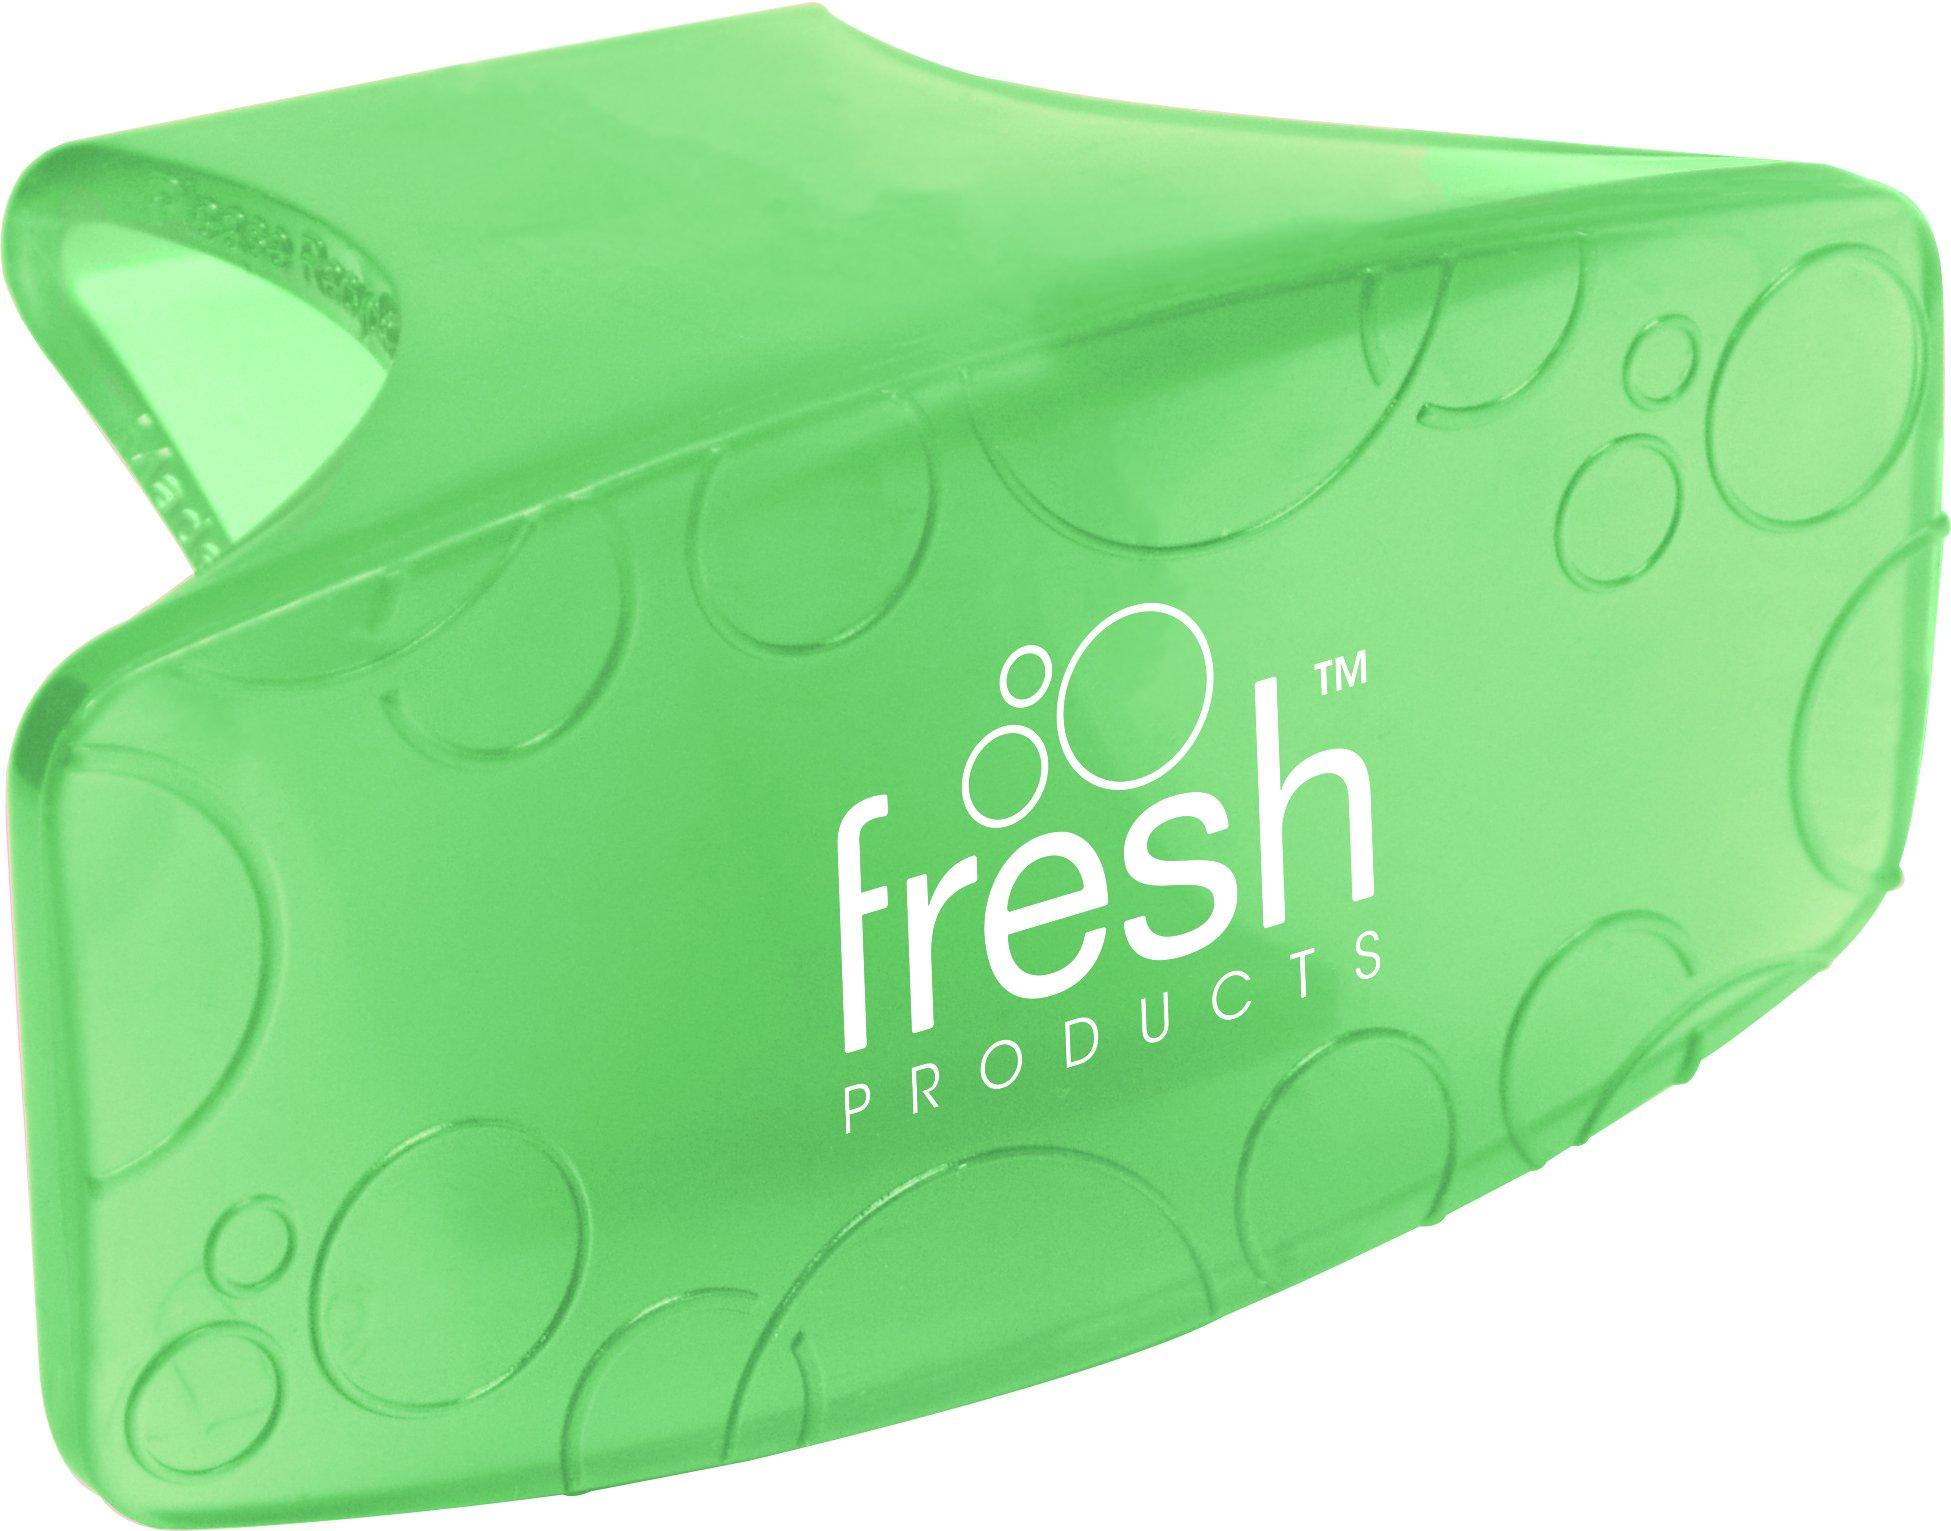 Fresh Products EBC-F-012I072M-02, Eco Bowl Clip Cucumber Melon, 12 Piece